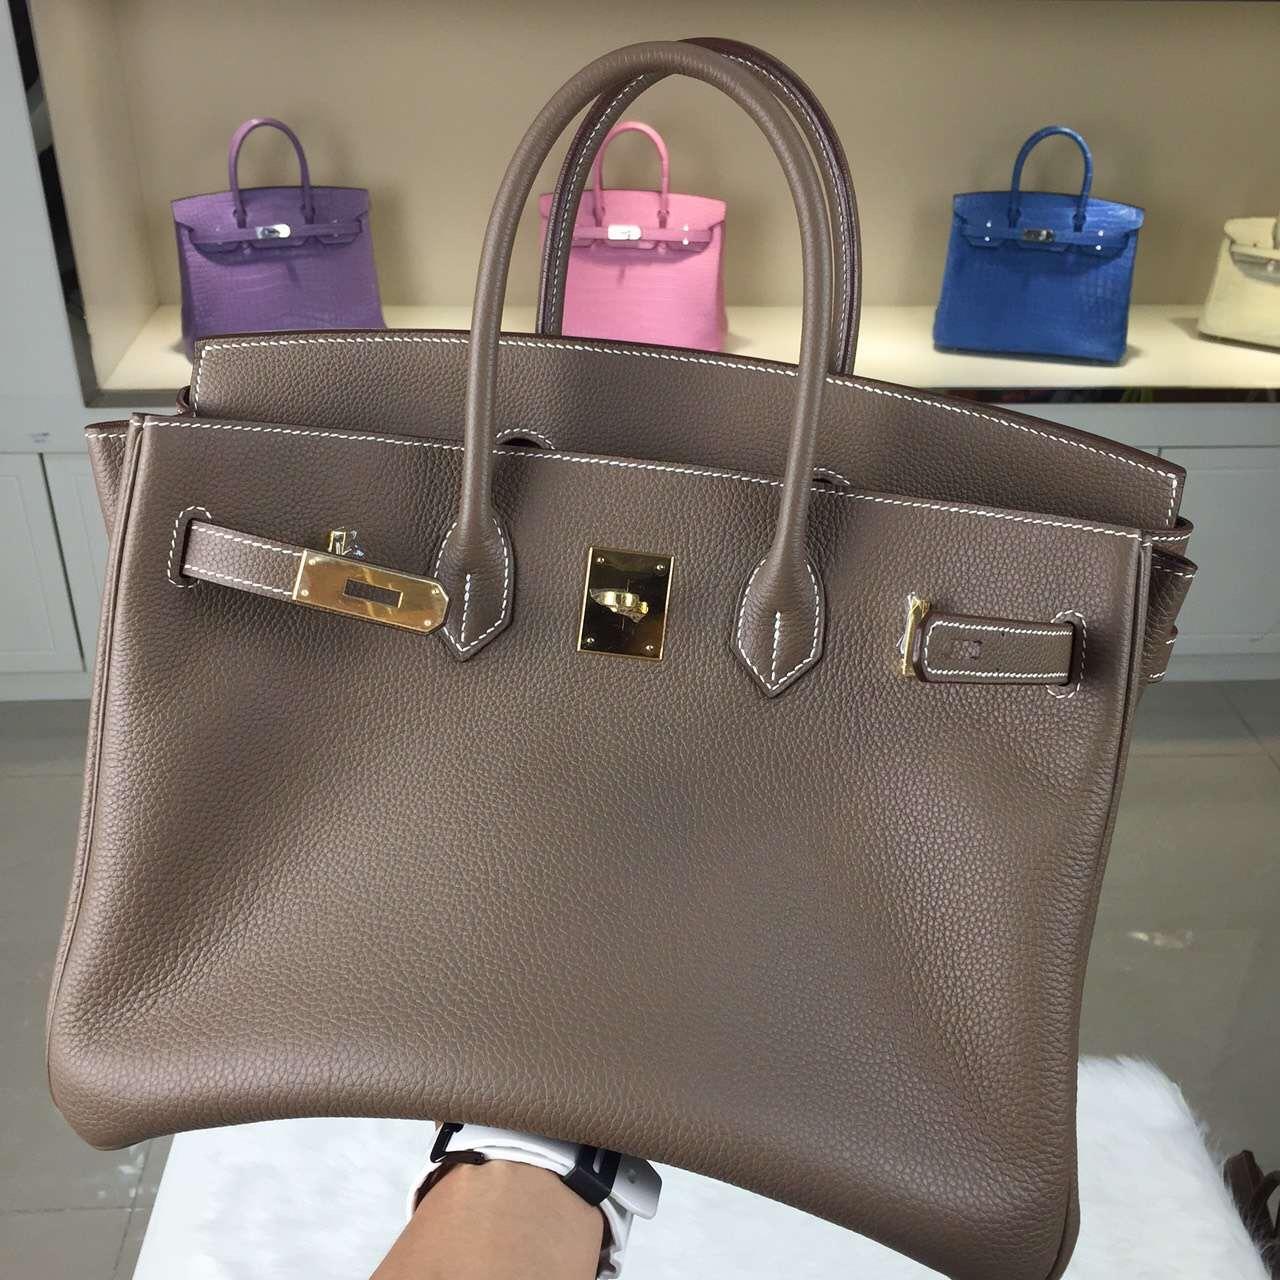 Wholesale Hermes Birkin 35CM CK18 Etoupe Grey Togo Leather Tote Bag